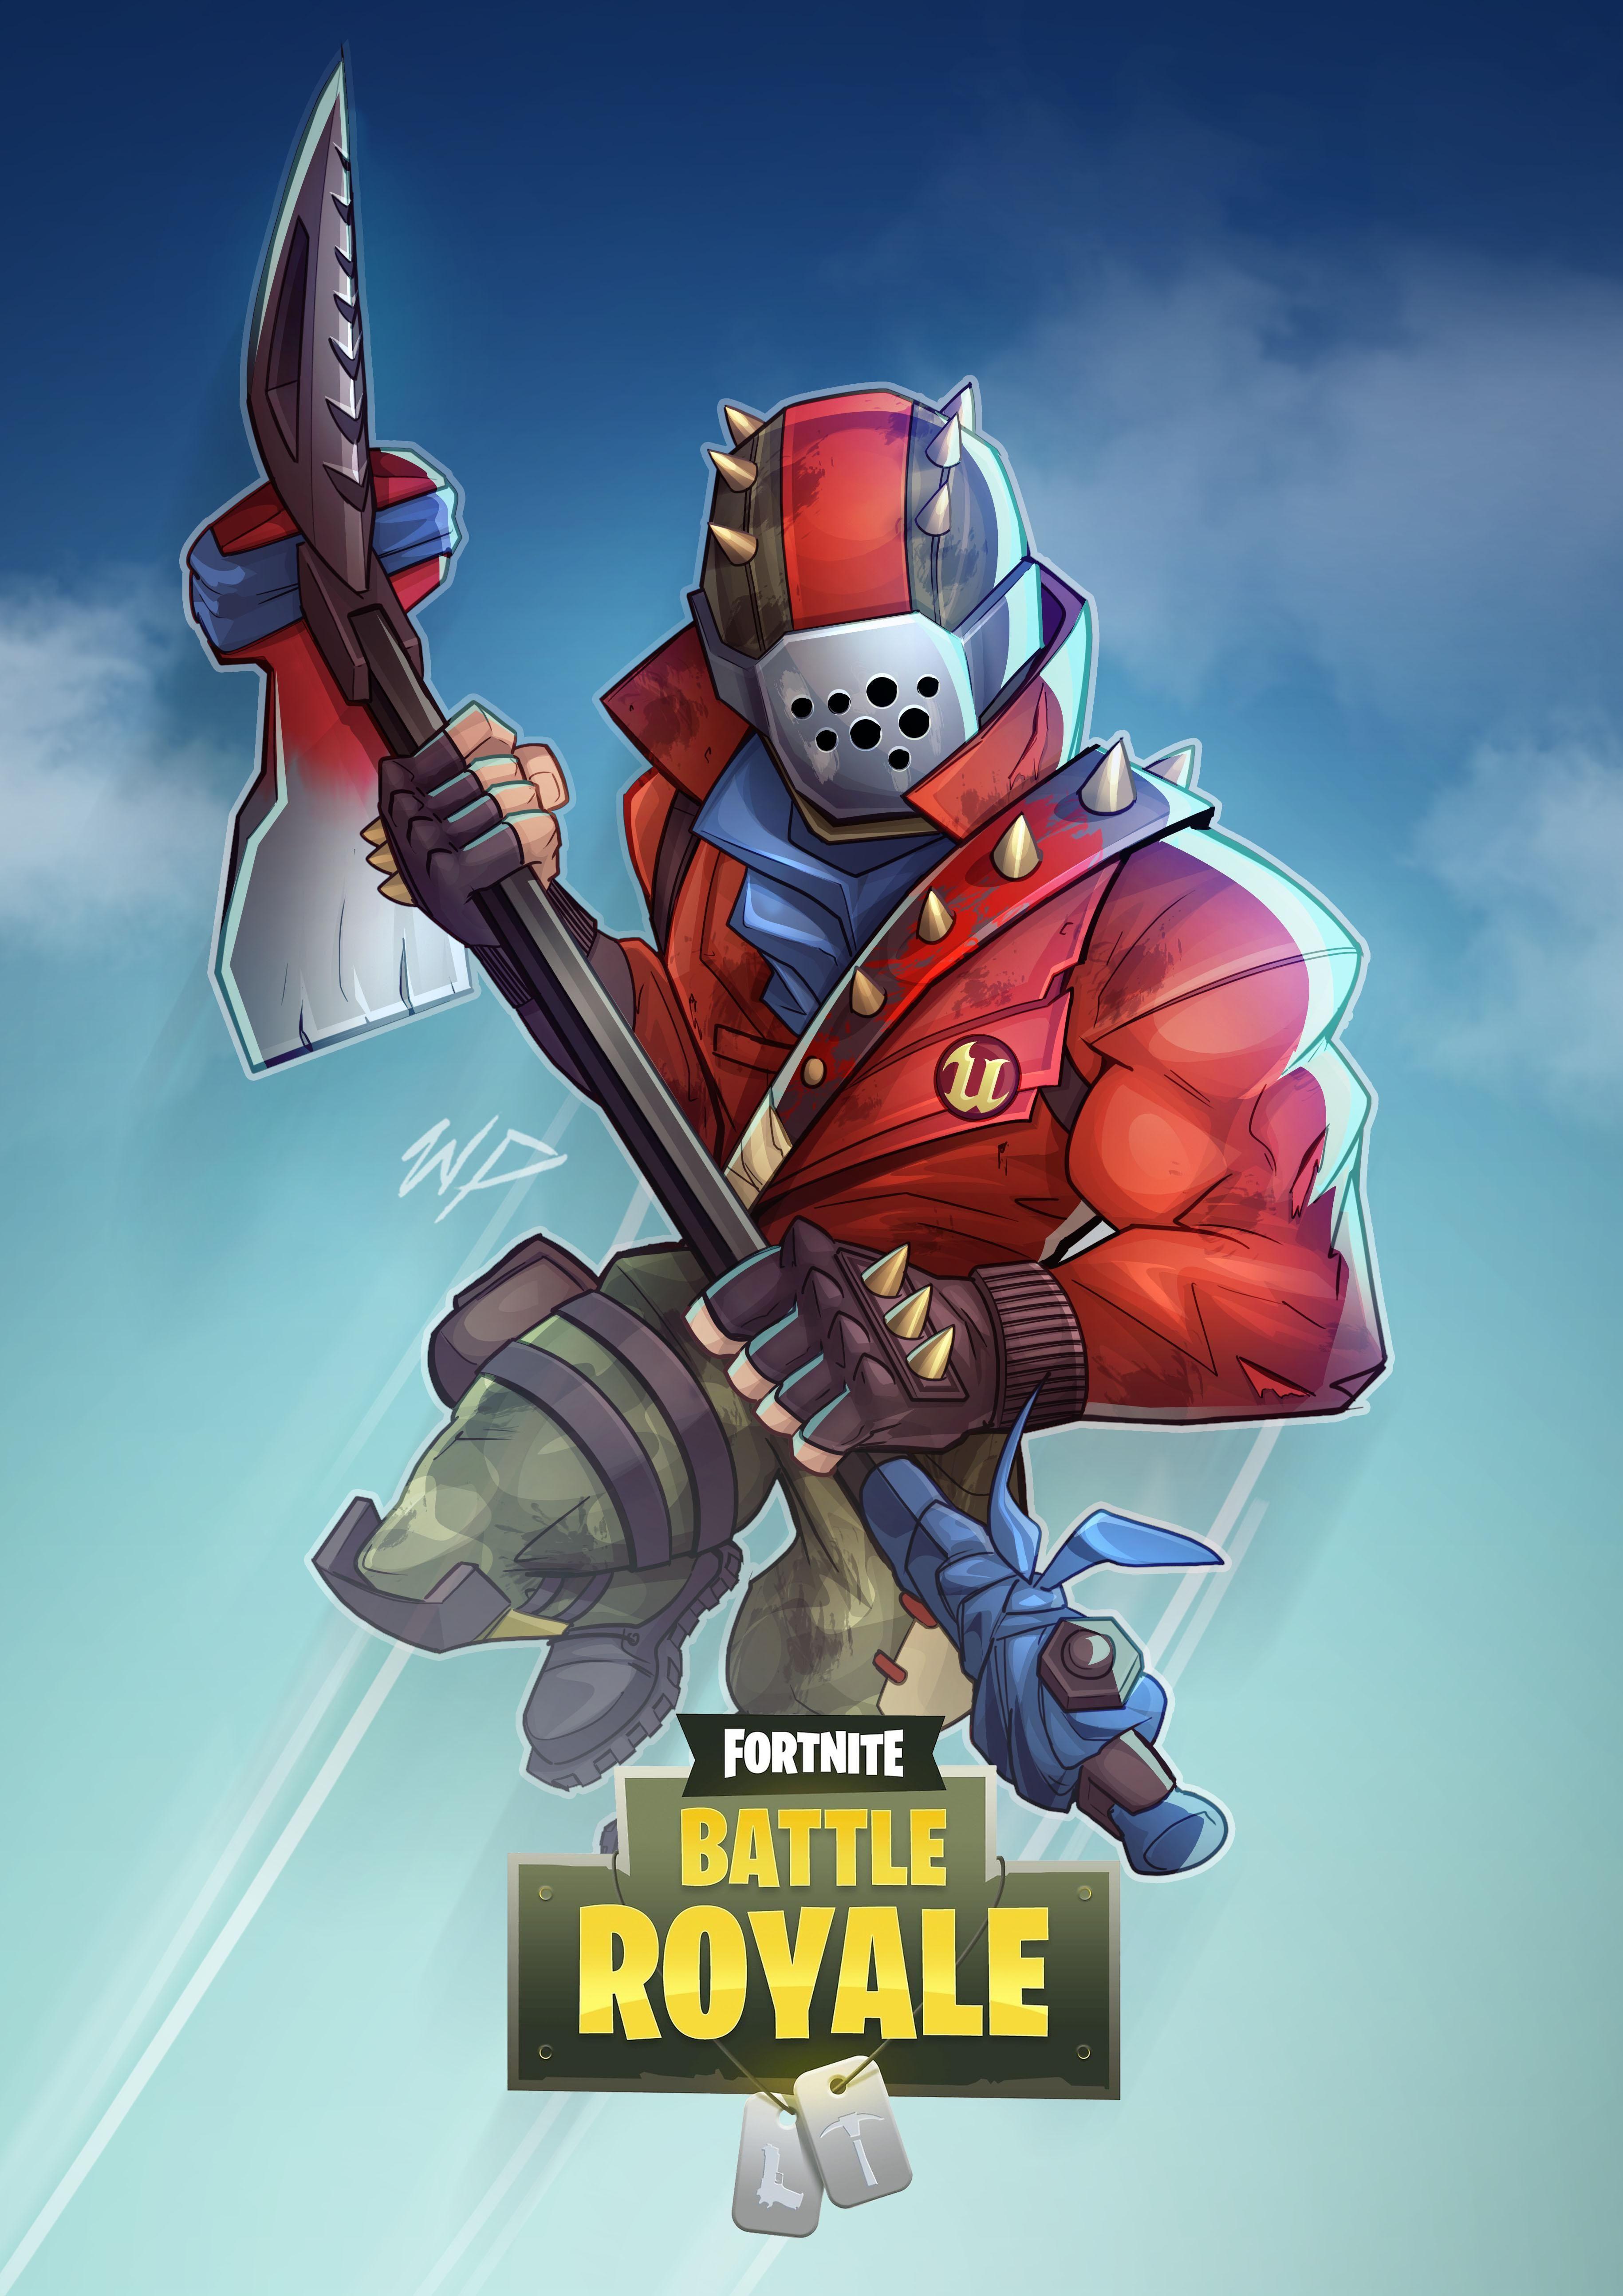 Fan Art With Images Ninja Wallpaper Gaming Posters Fortnite